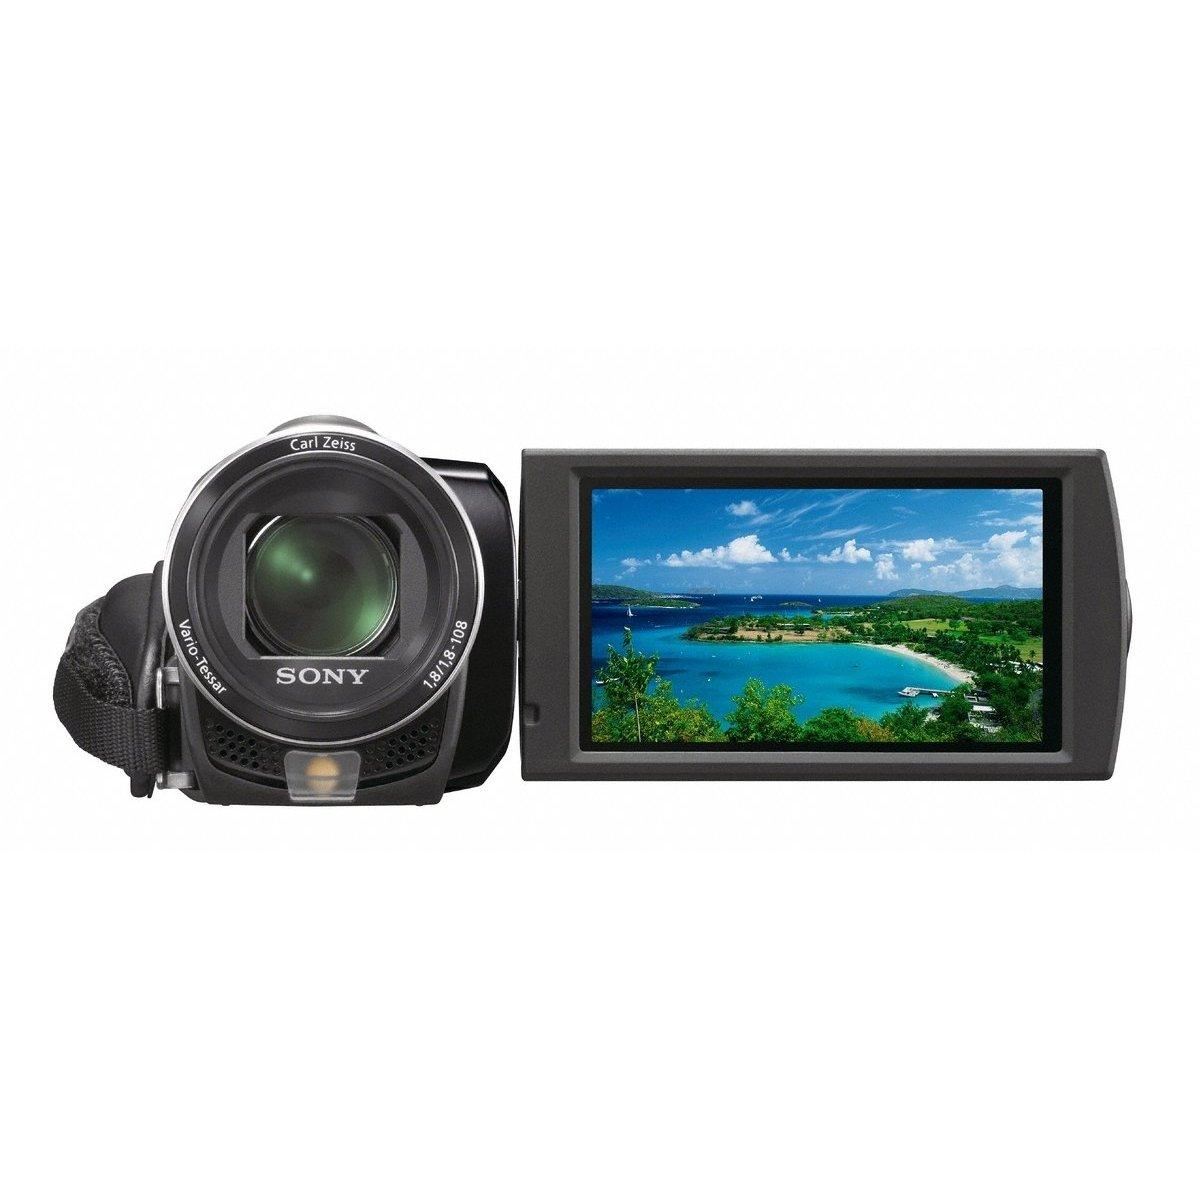 https://thetechjournal.com/wp-content/uploads/images/1108/1314692838-sony-dcrsx45-handycam-camcorder--2.jpg